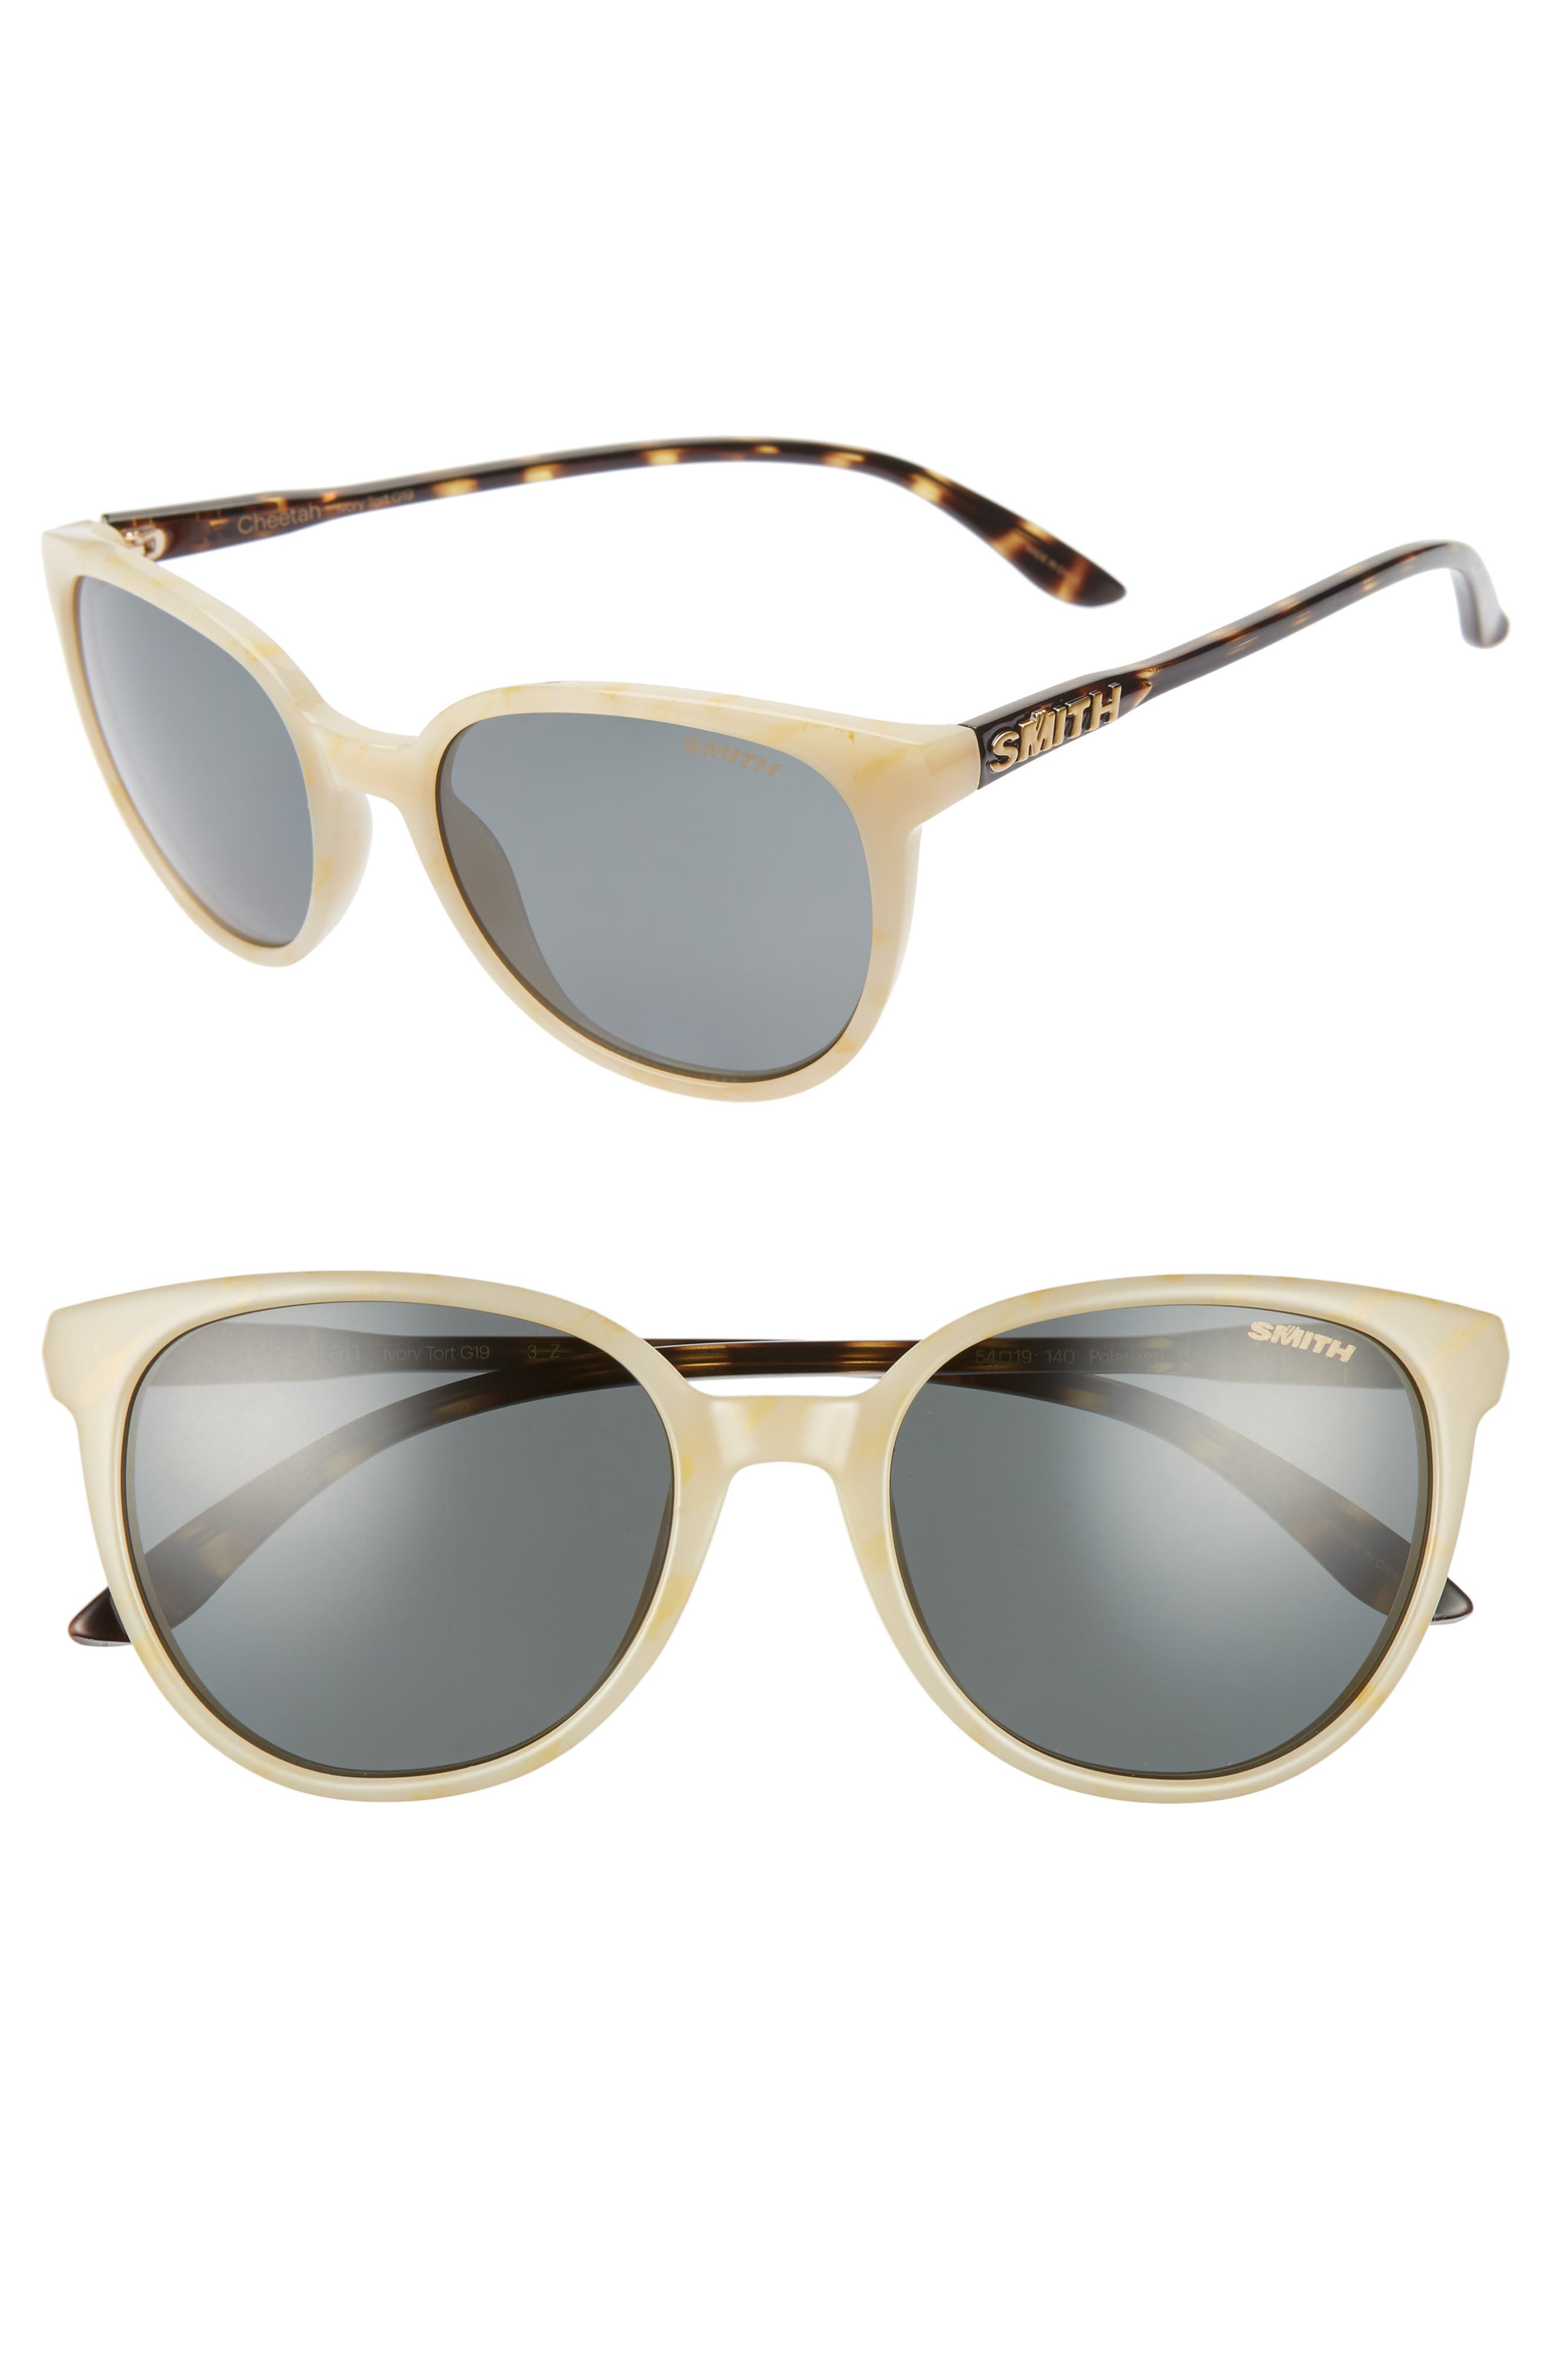 SMITH, Cheetah 54mm ChromaPop<sup>™</sup> Polarized Round Sunglasses, Main thumbnail 1, color, IVORY TORTOISE